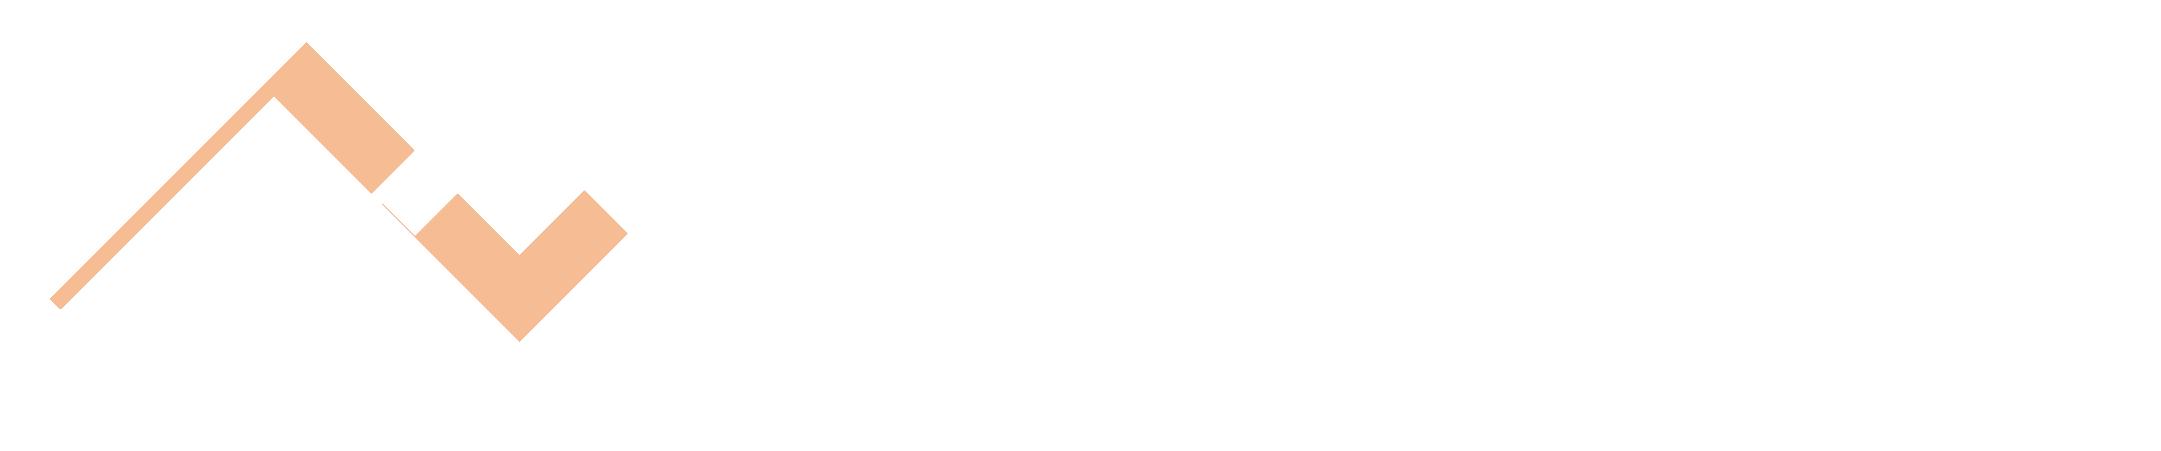 LM_Digital_DesignSummit_logos_WH_Horizontal